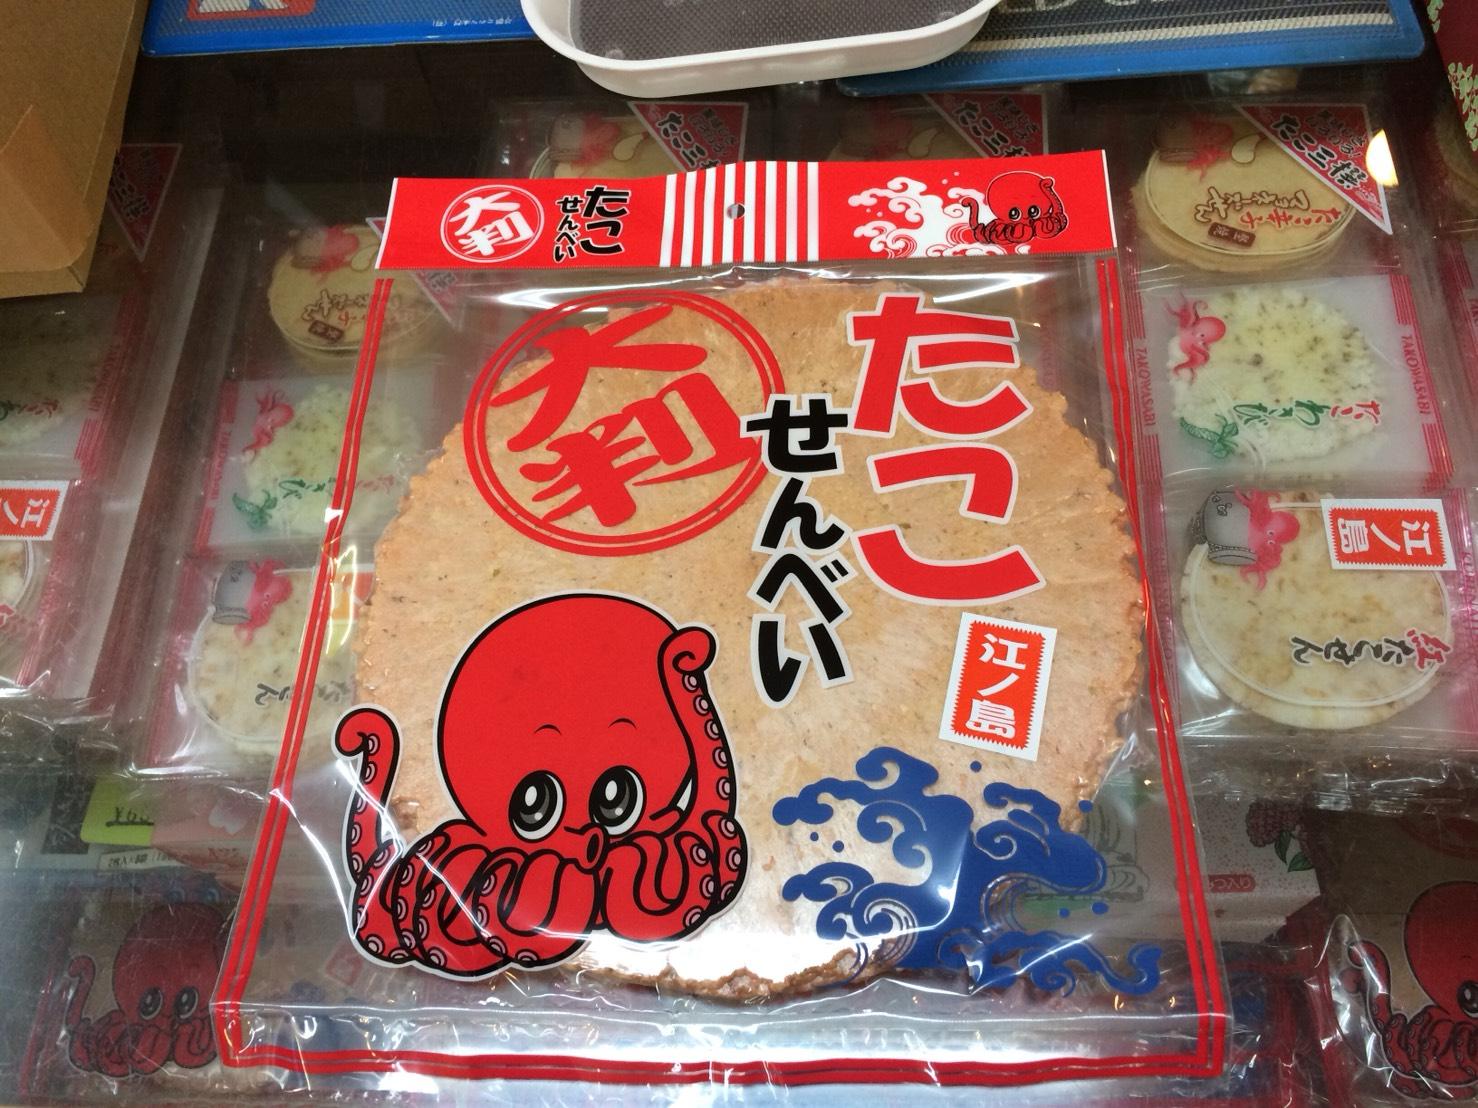 Octopus Cracker